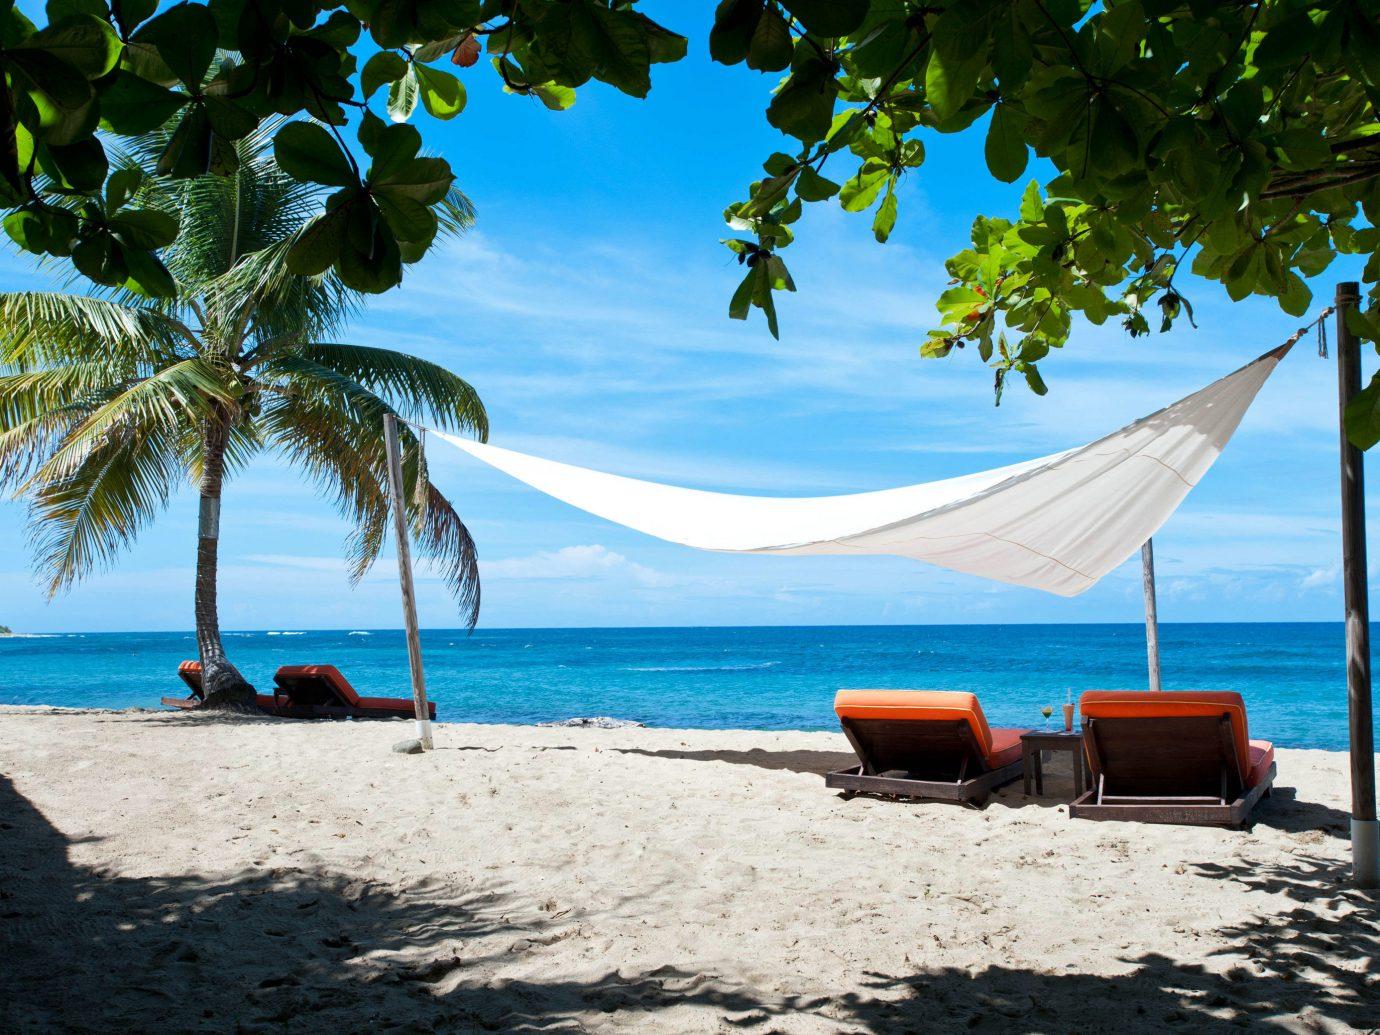 Trip Ideas outdoor sky water tree Beach umbrella shore chair body of water Sea Nature caribbean vacation Ocean tropics arecales palm bay Island Lagoon sandy shade lined day